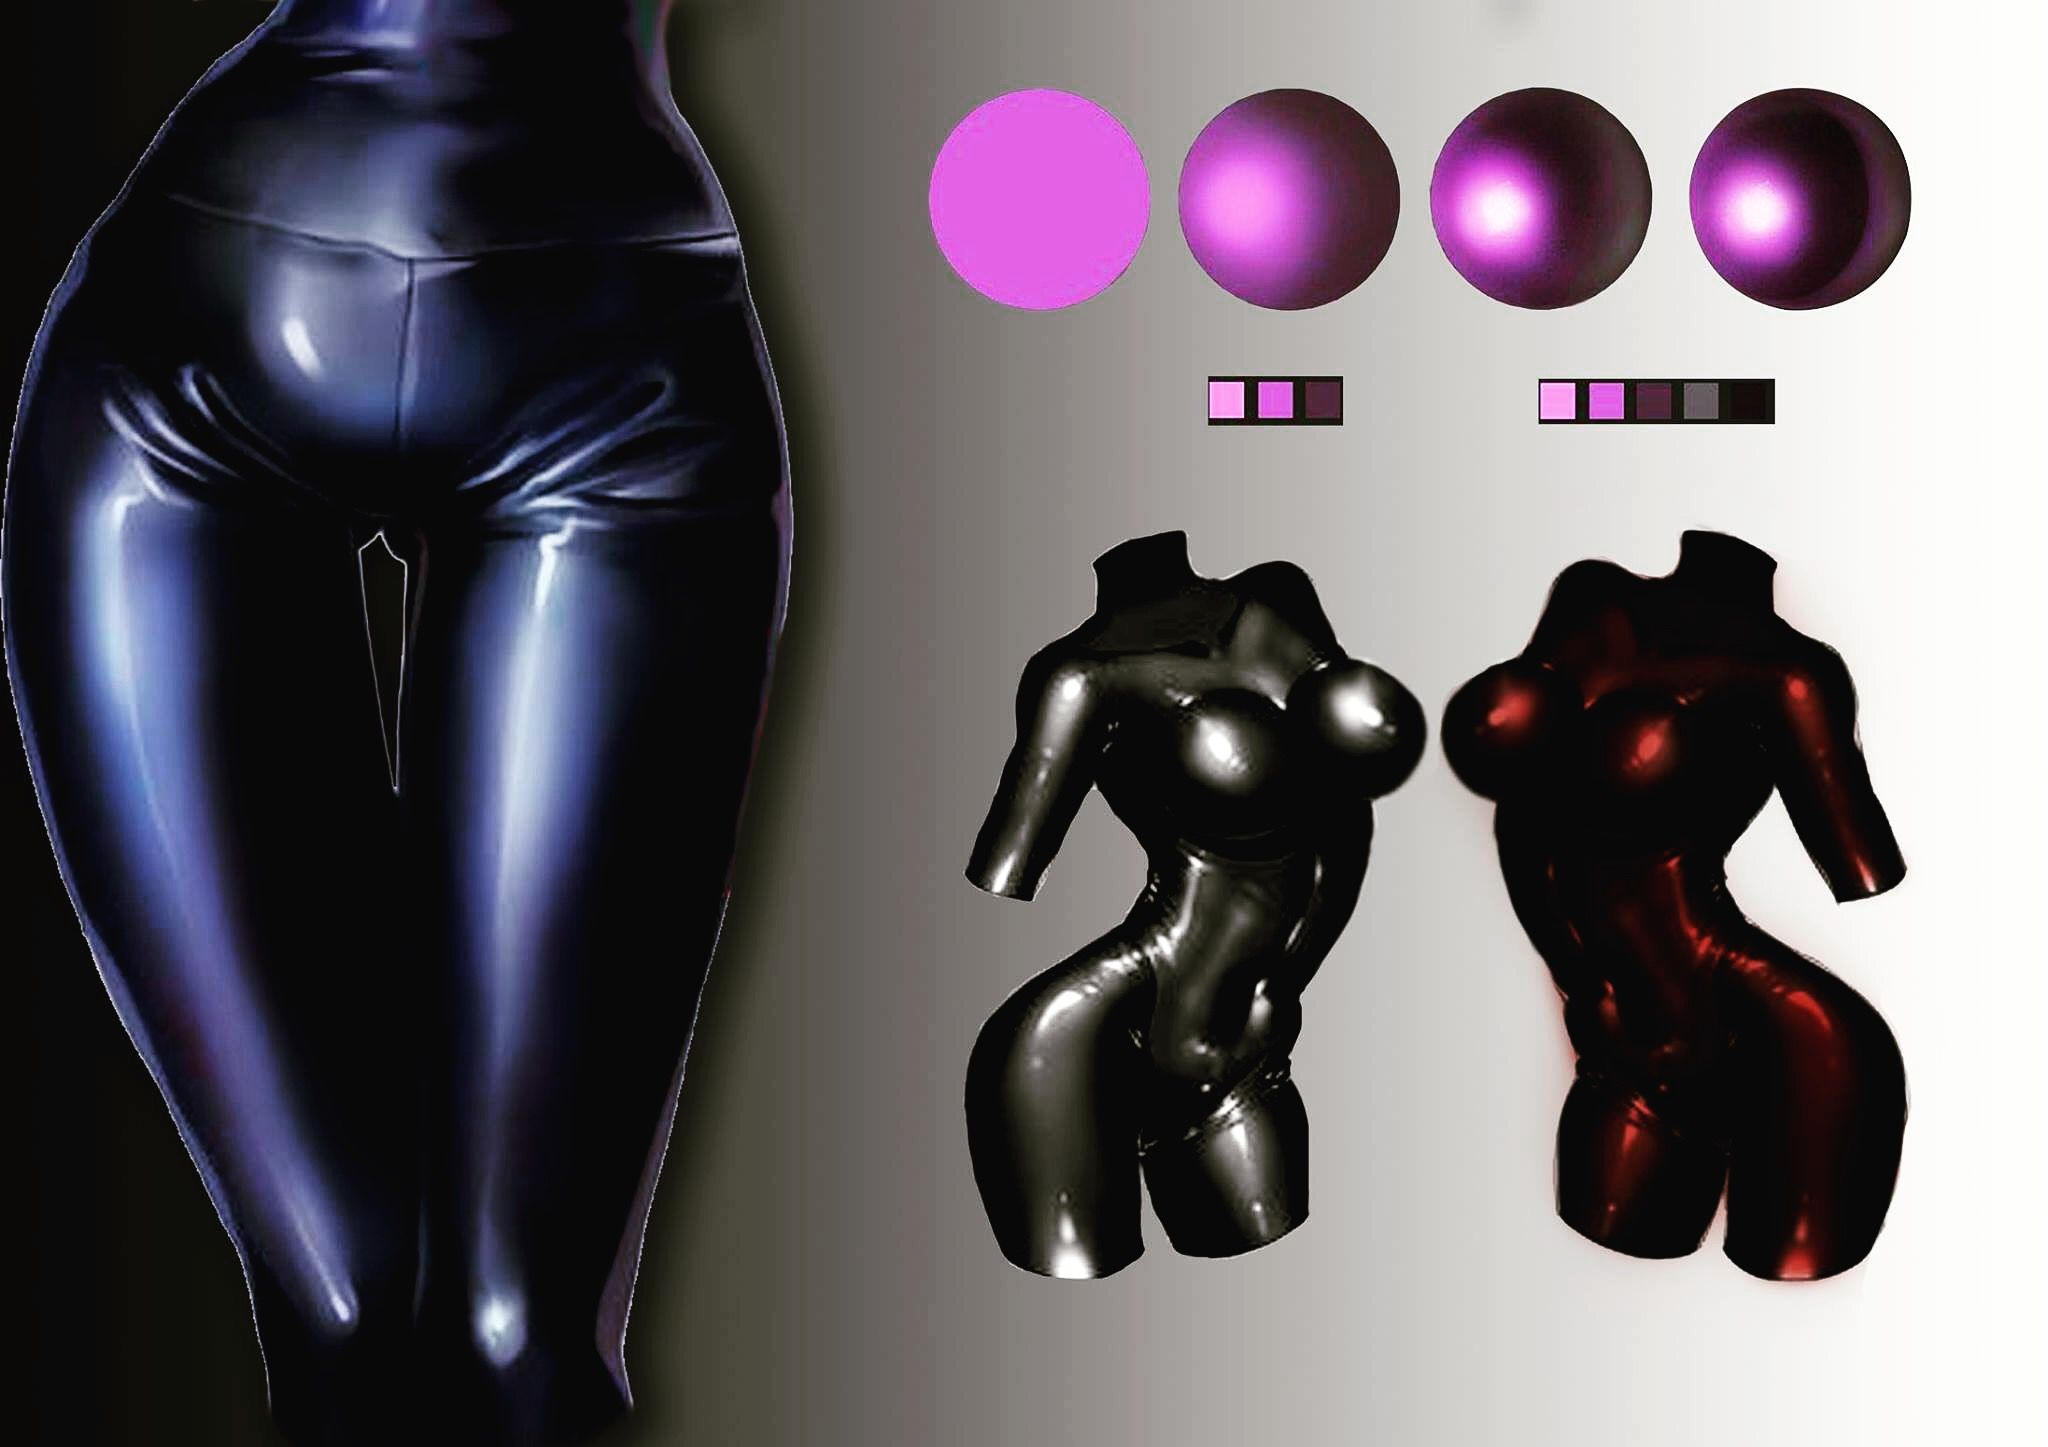 Latex graphics positiontures, femdom panty humiliation